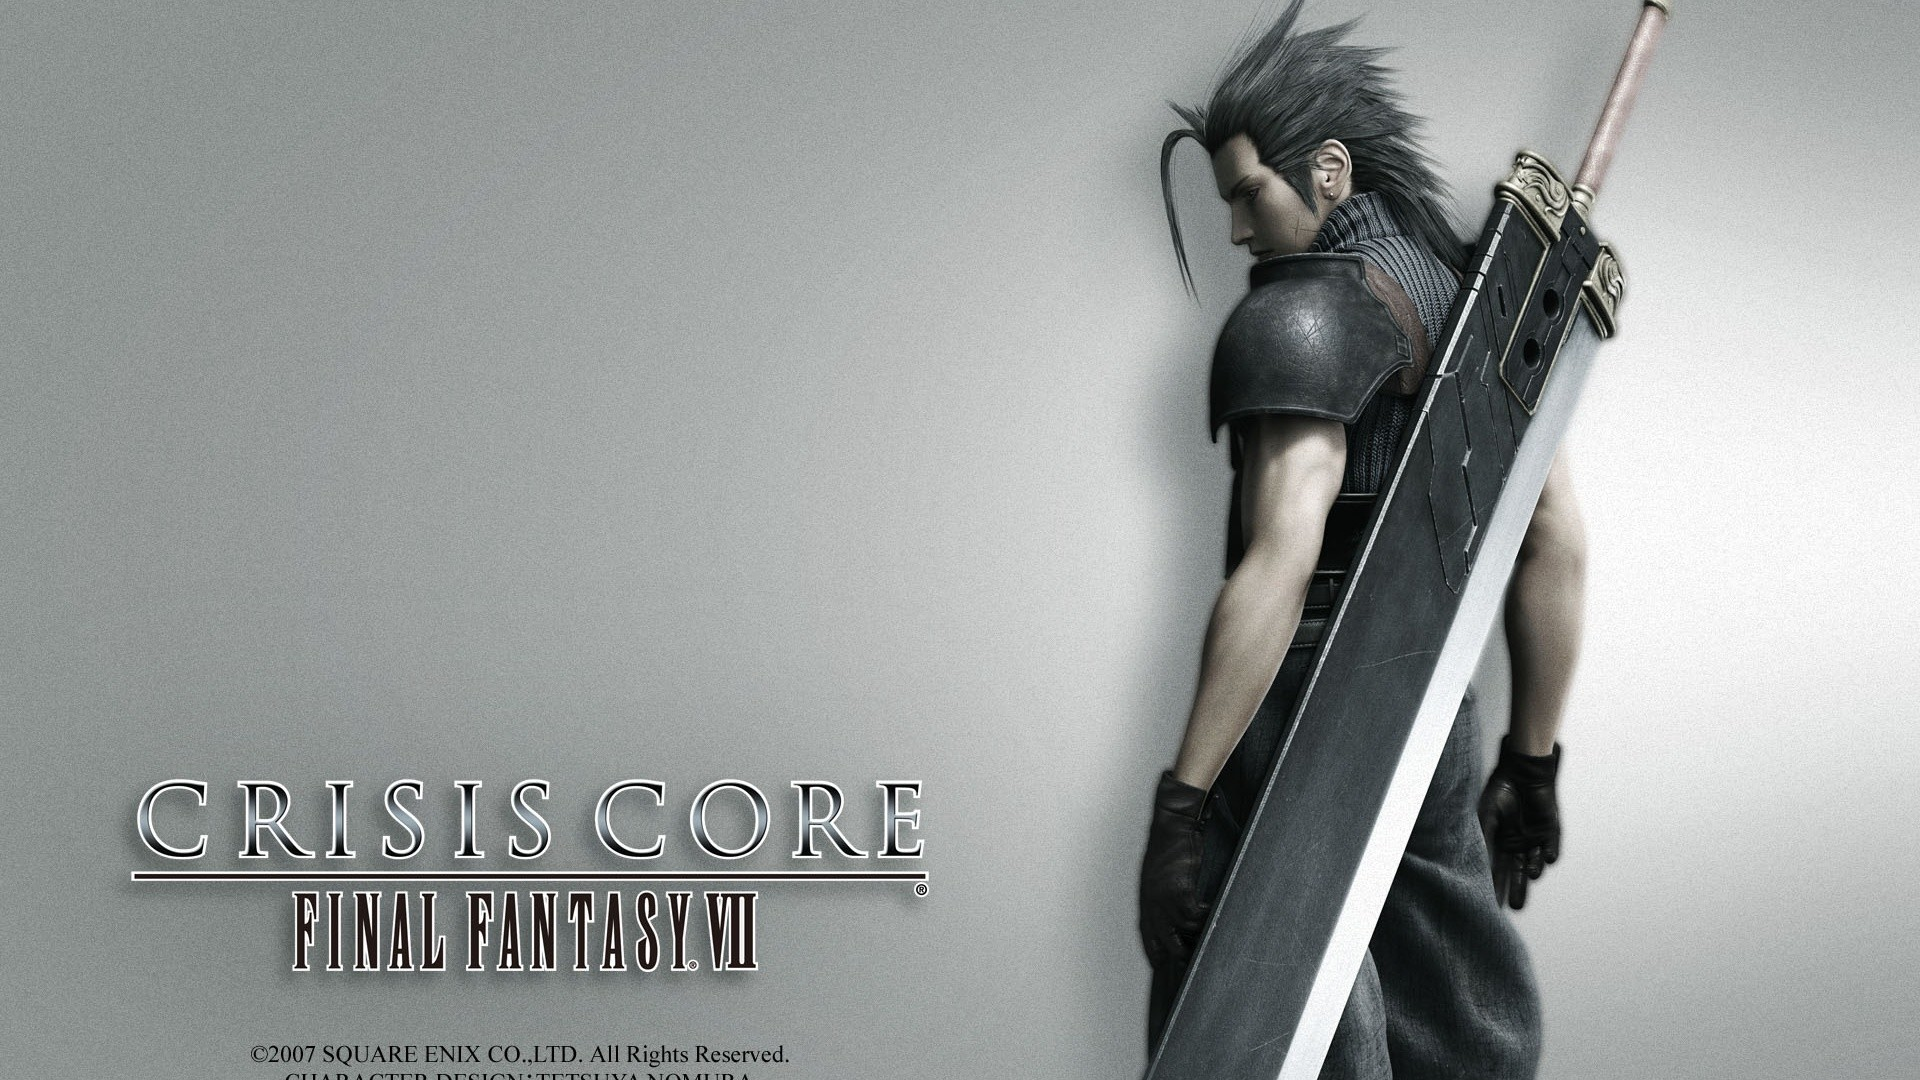 9 HD Final Fantasy VII Desktop Wallpapers For Free Download